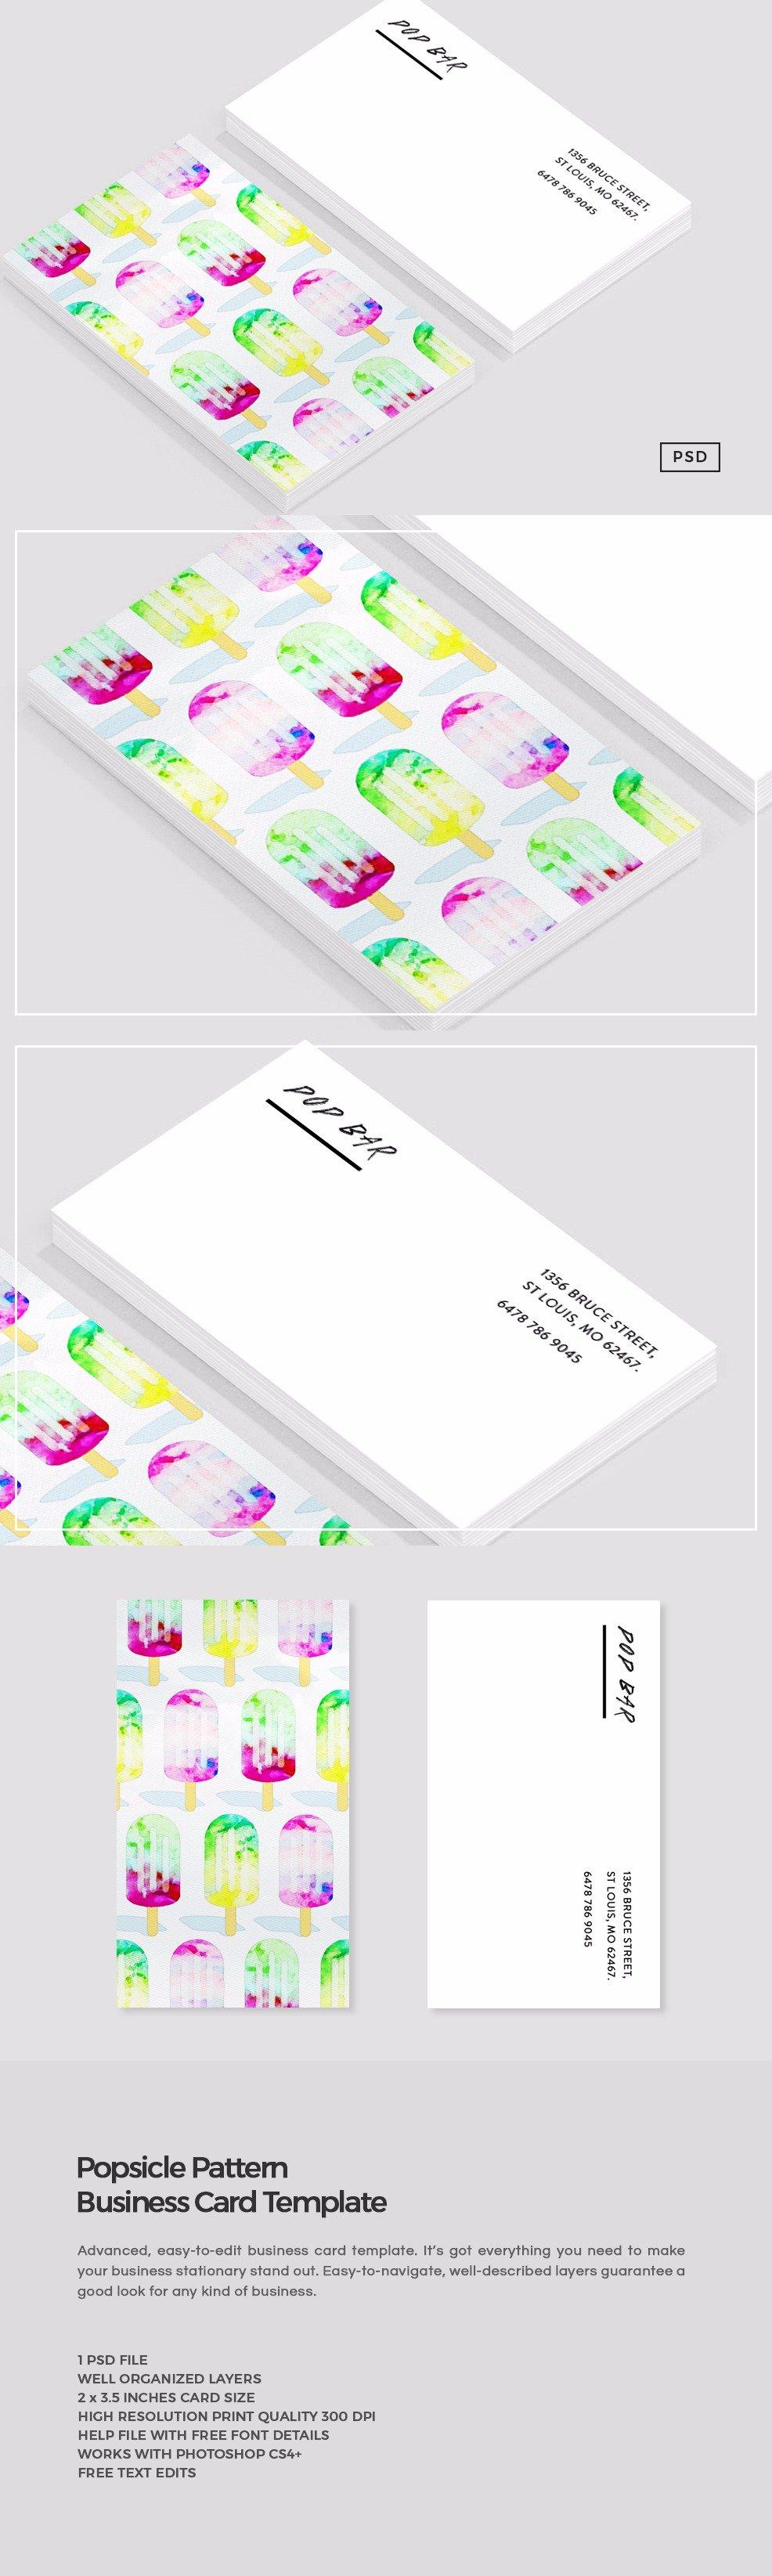 Business card size photoshop cs4 images card design and card template business card size photoshop cs4 choice image card design and card business card template photoshop cs4 reheart Images